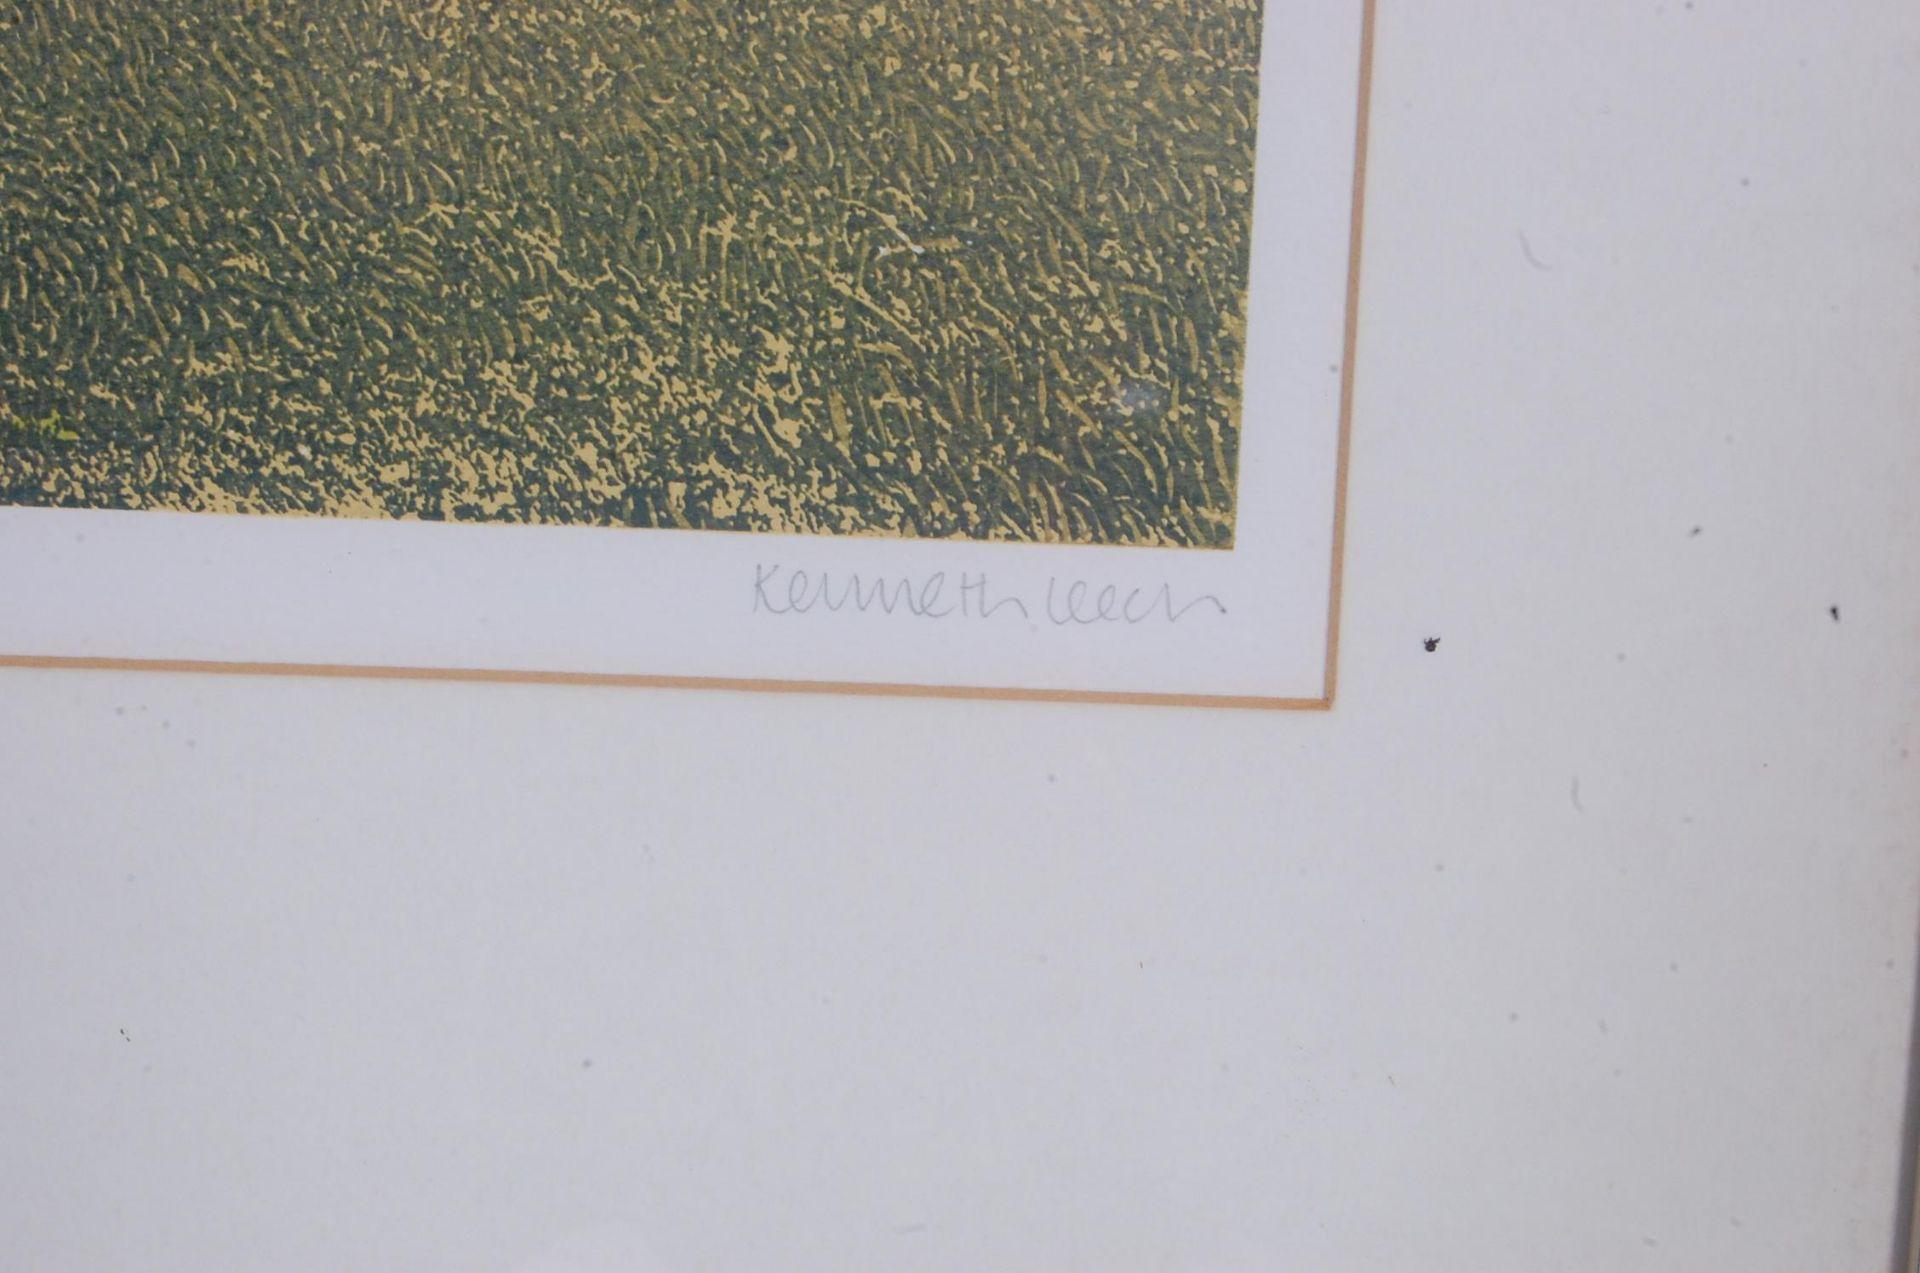 SIGNED LITHOGRAPH PLEINT BY KENNETH LEECH - BRIDLE WAY - Bild 7 aus 8